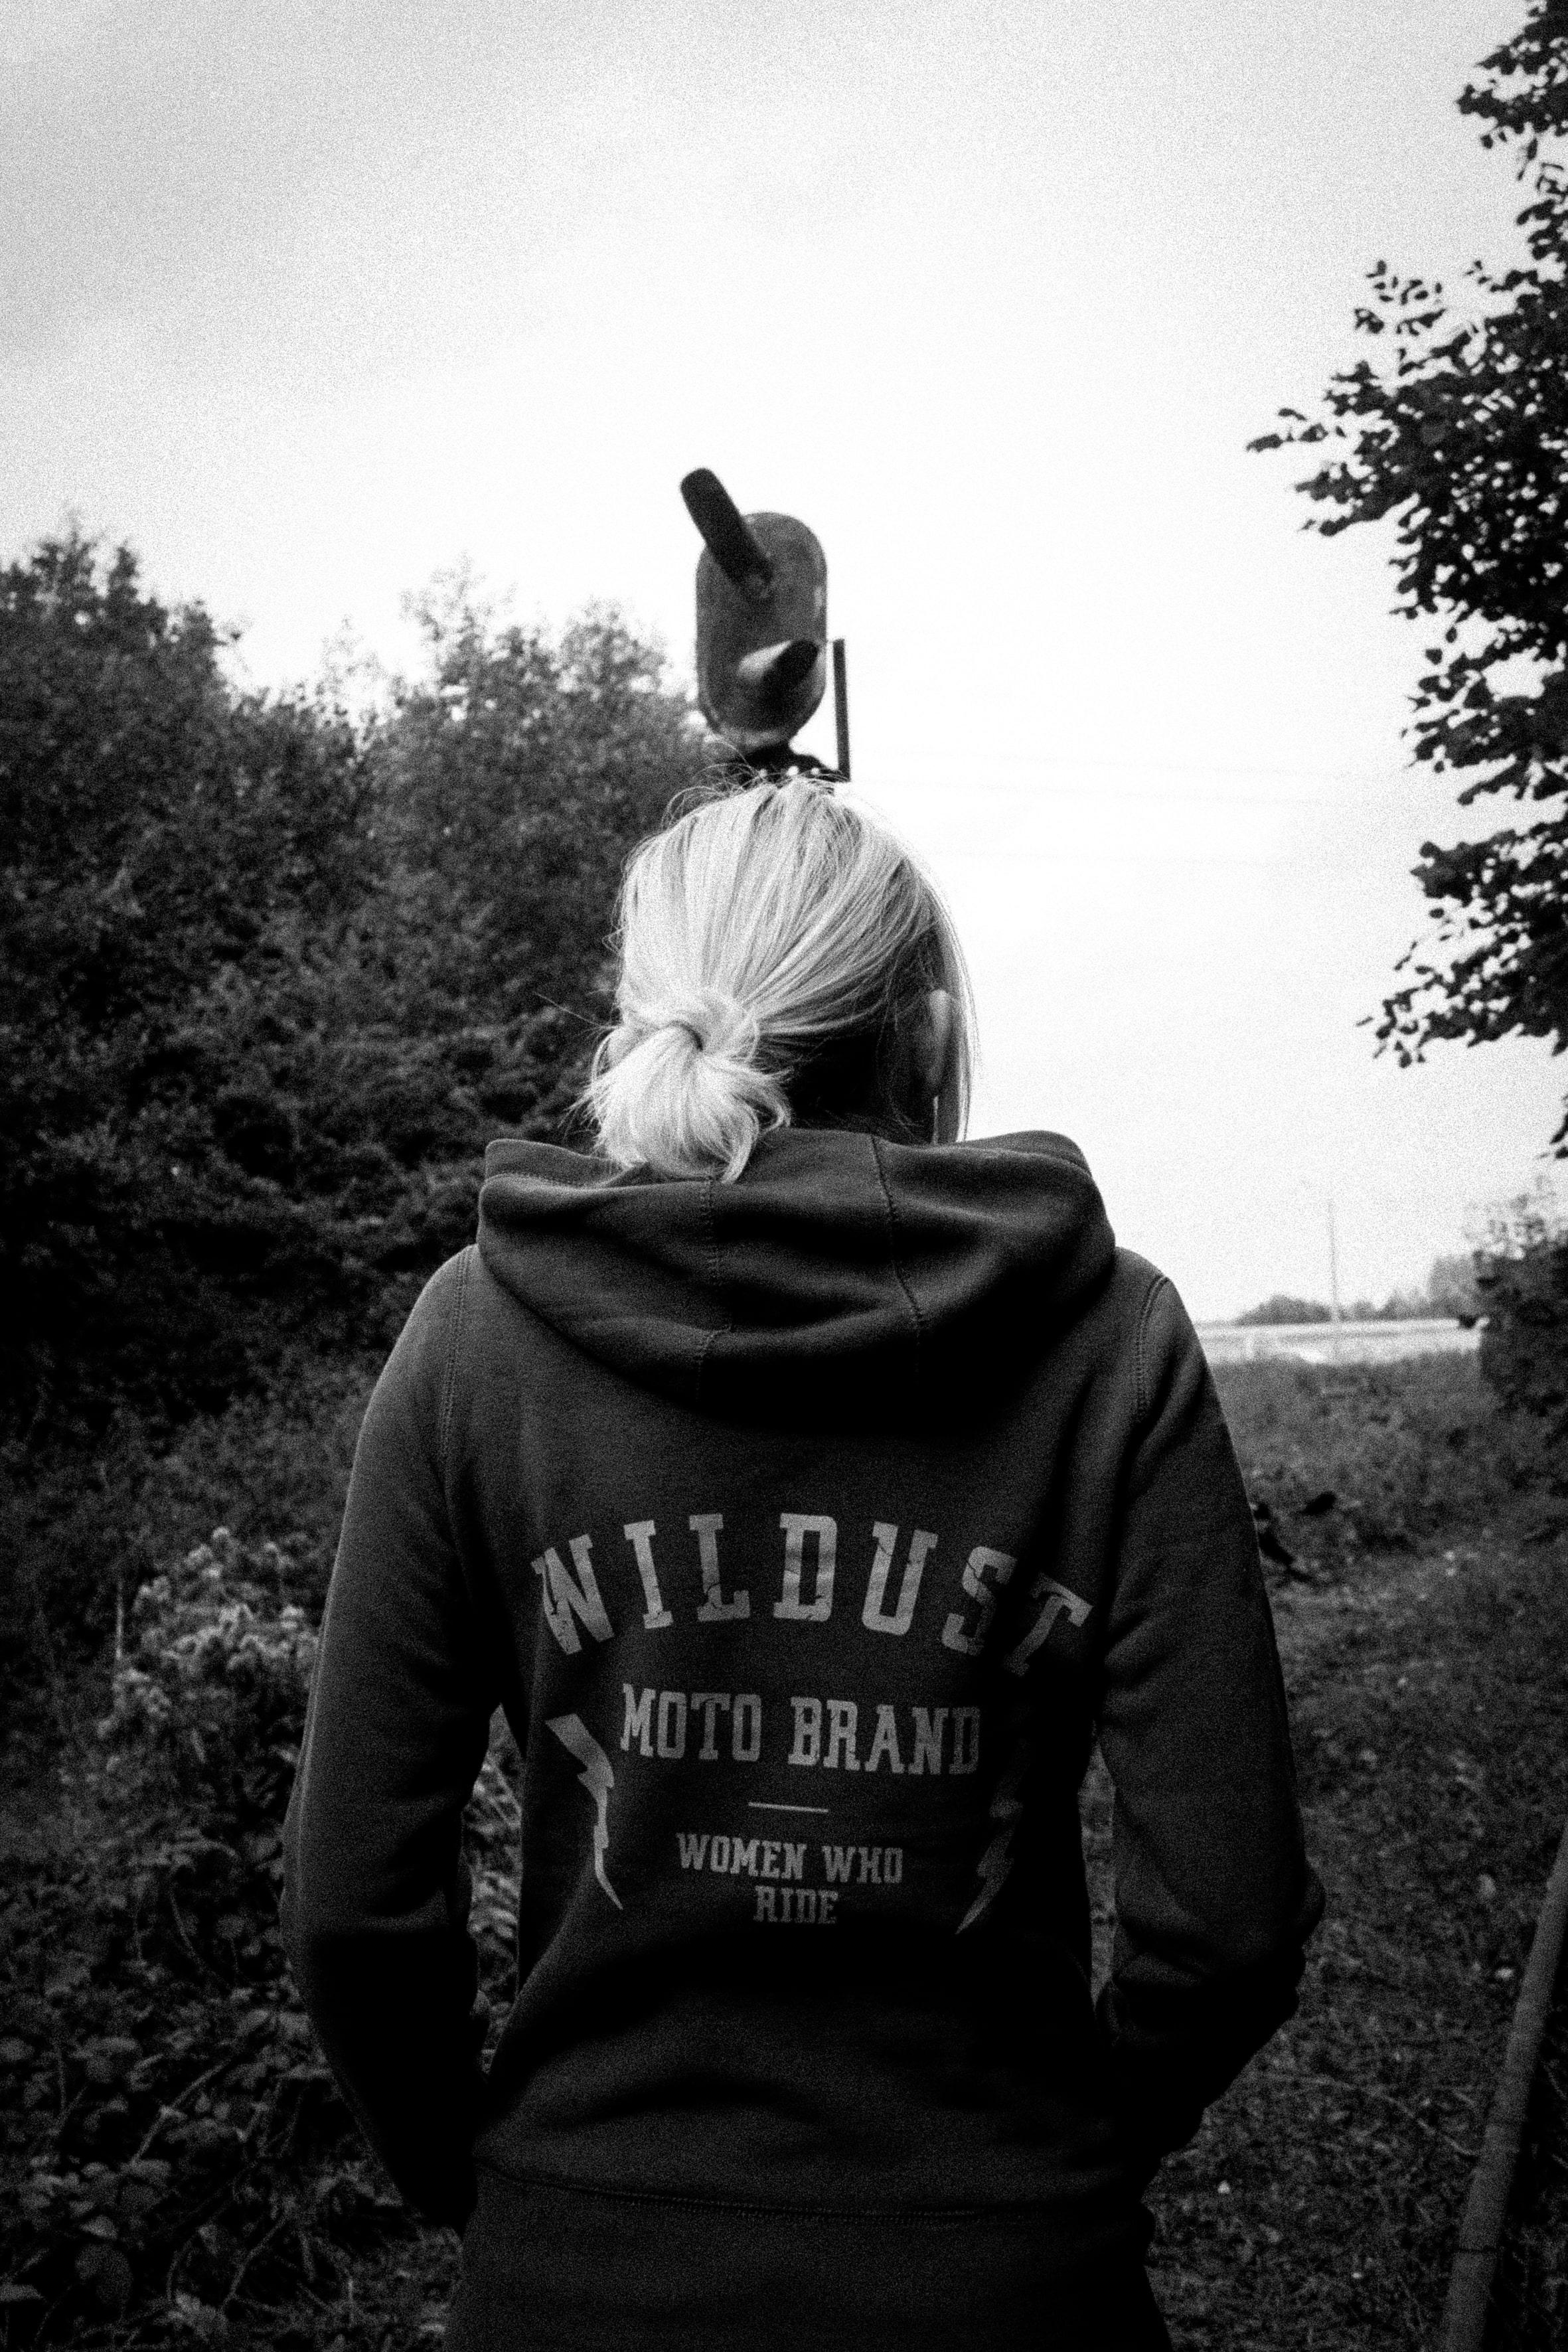 Carnet Sauvage - blog mode Lille - wildust sisters48.jpg